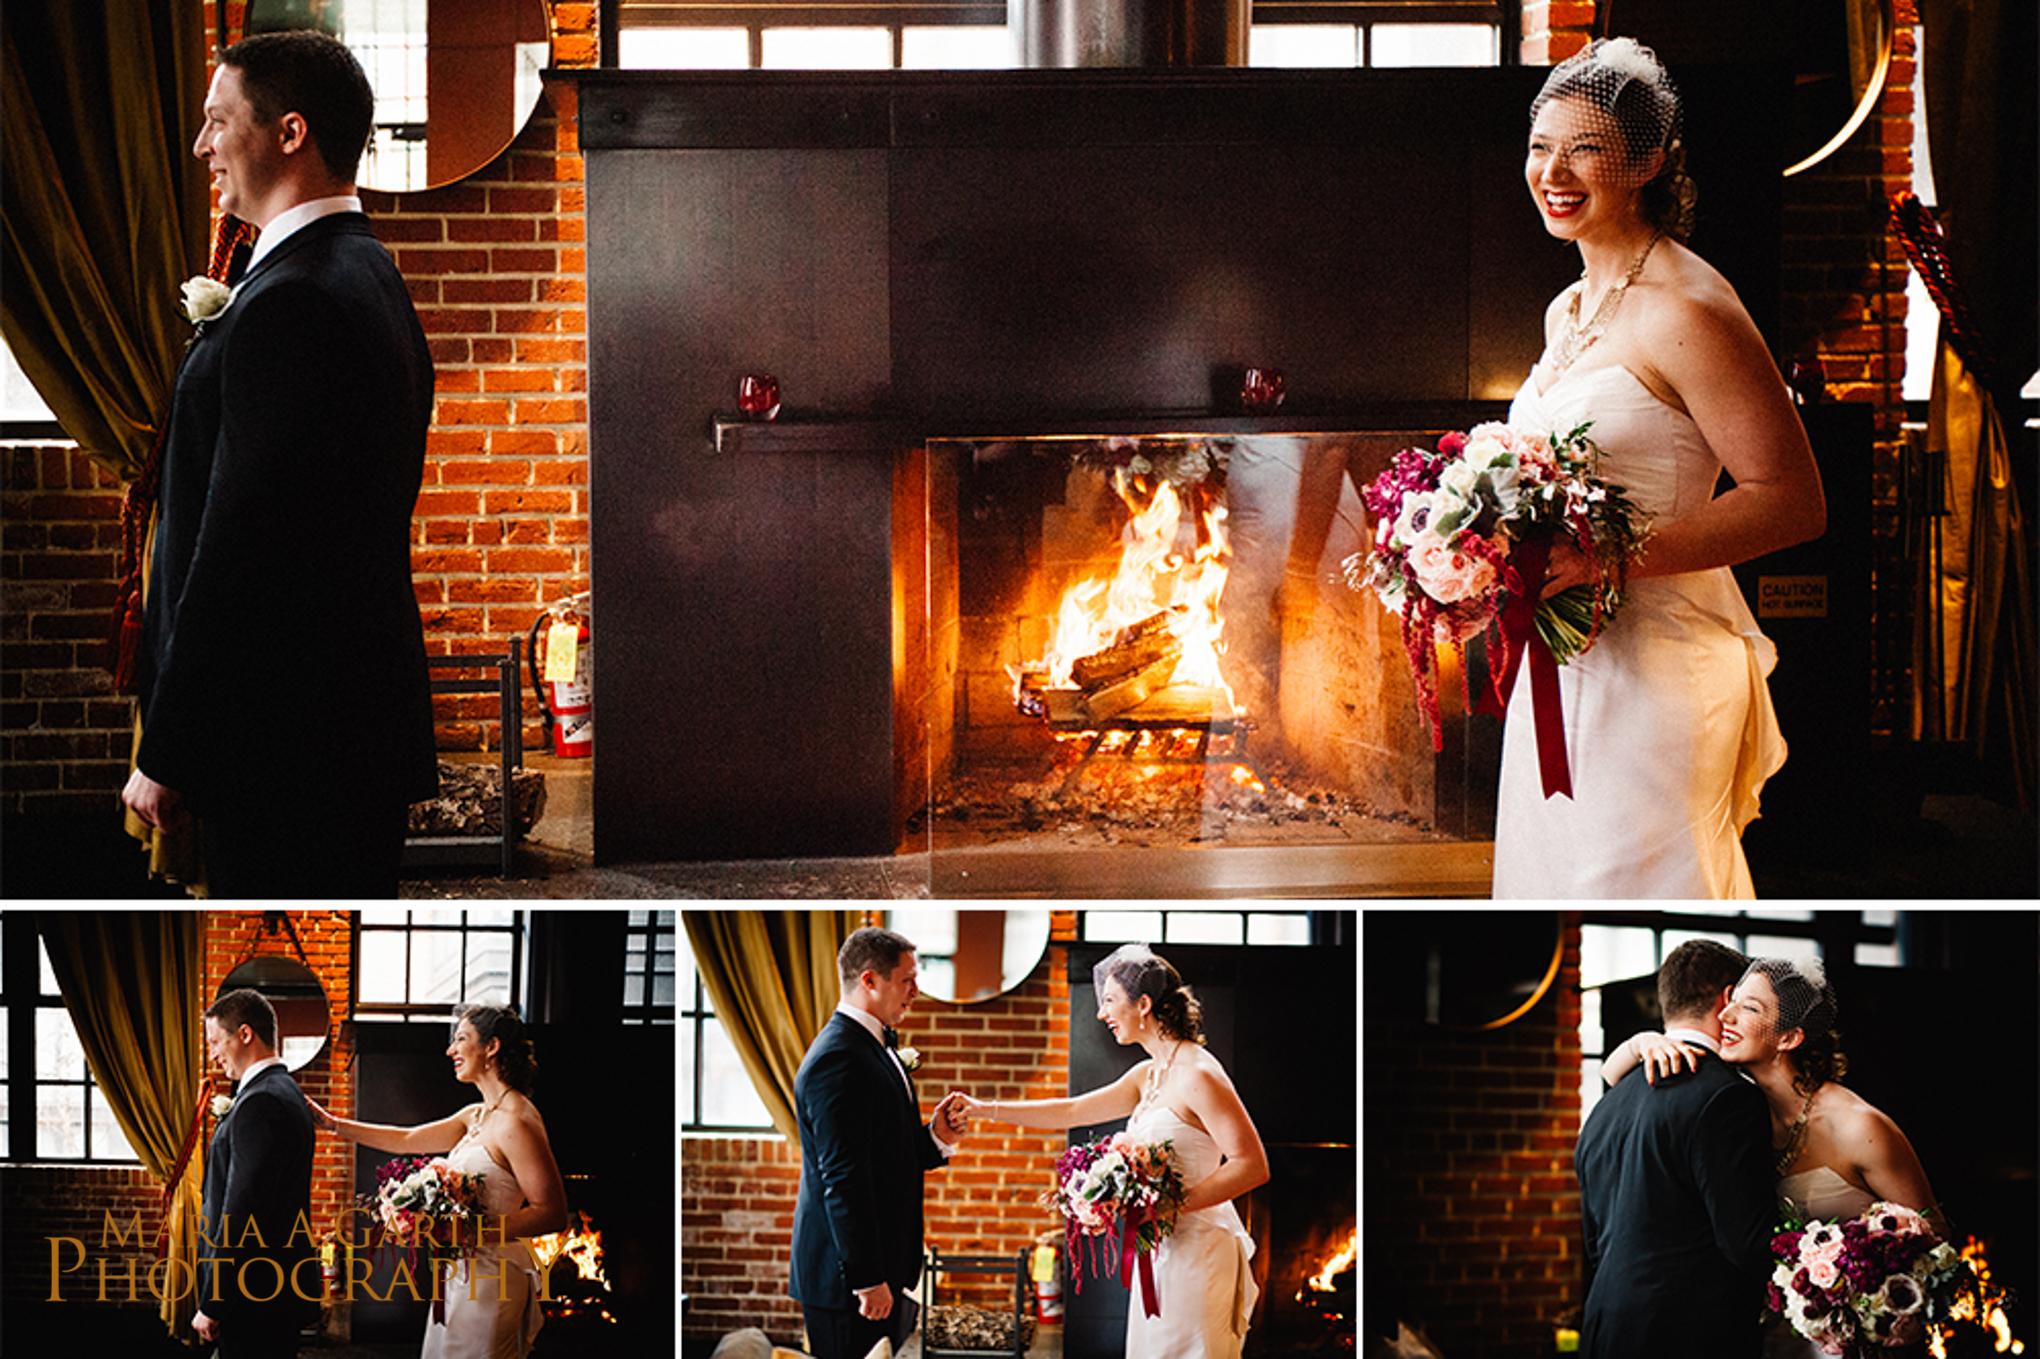 Georgetown Weddings, DC Wedding Photography, Weddings at the Ritz in DC_009.jpg